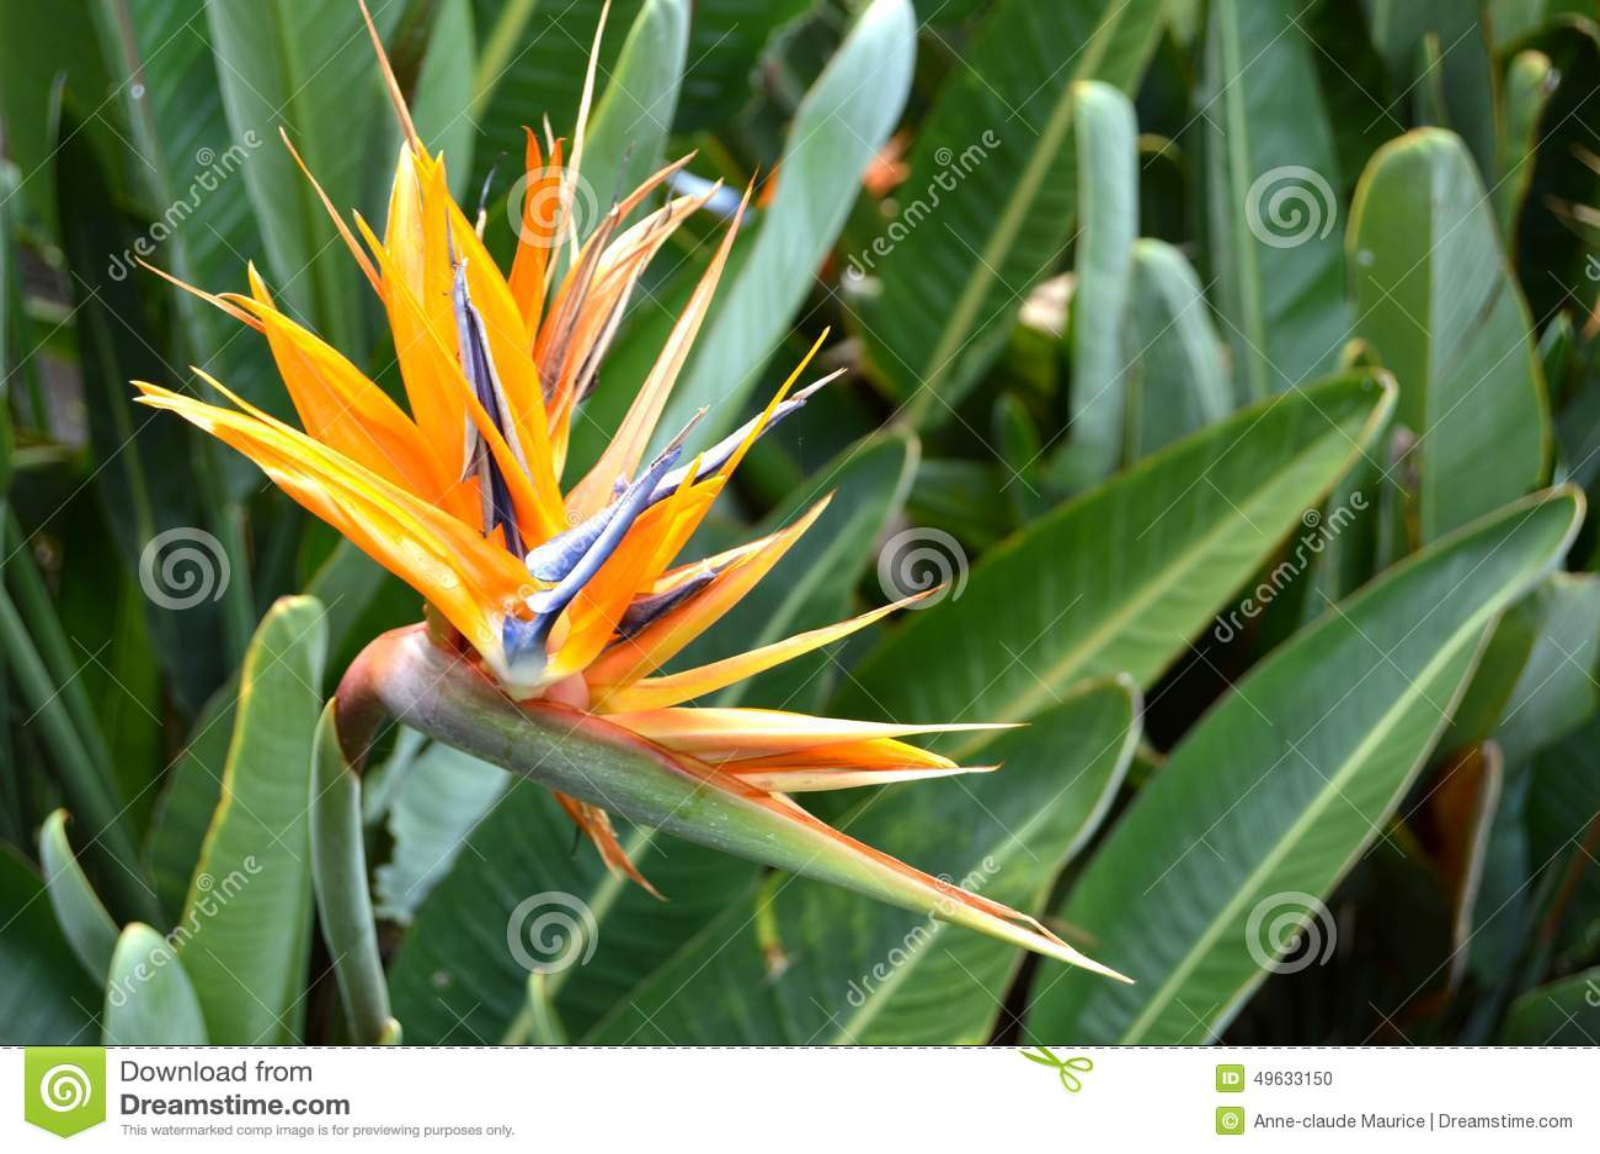 Bird of paradis flower stock photo image of paradis 49633150 bird of paradis flower buycottarizona